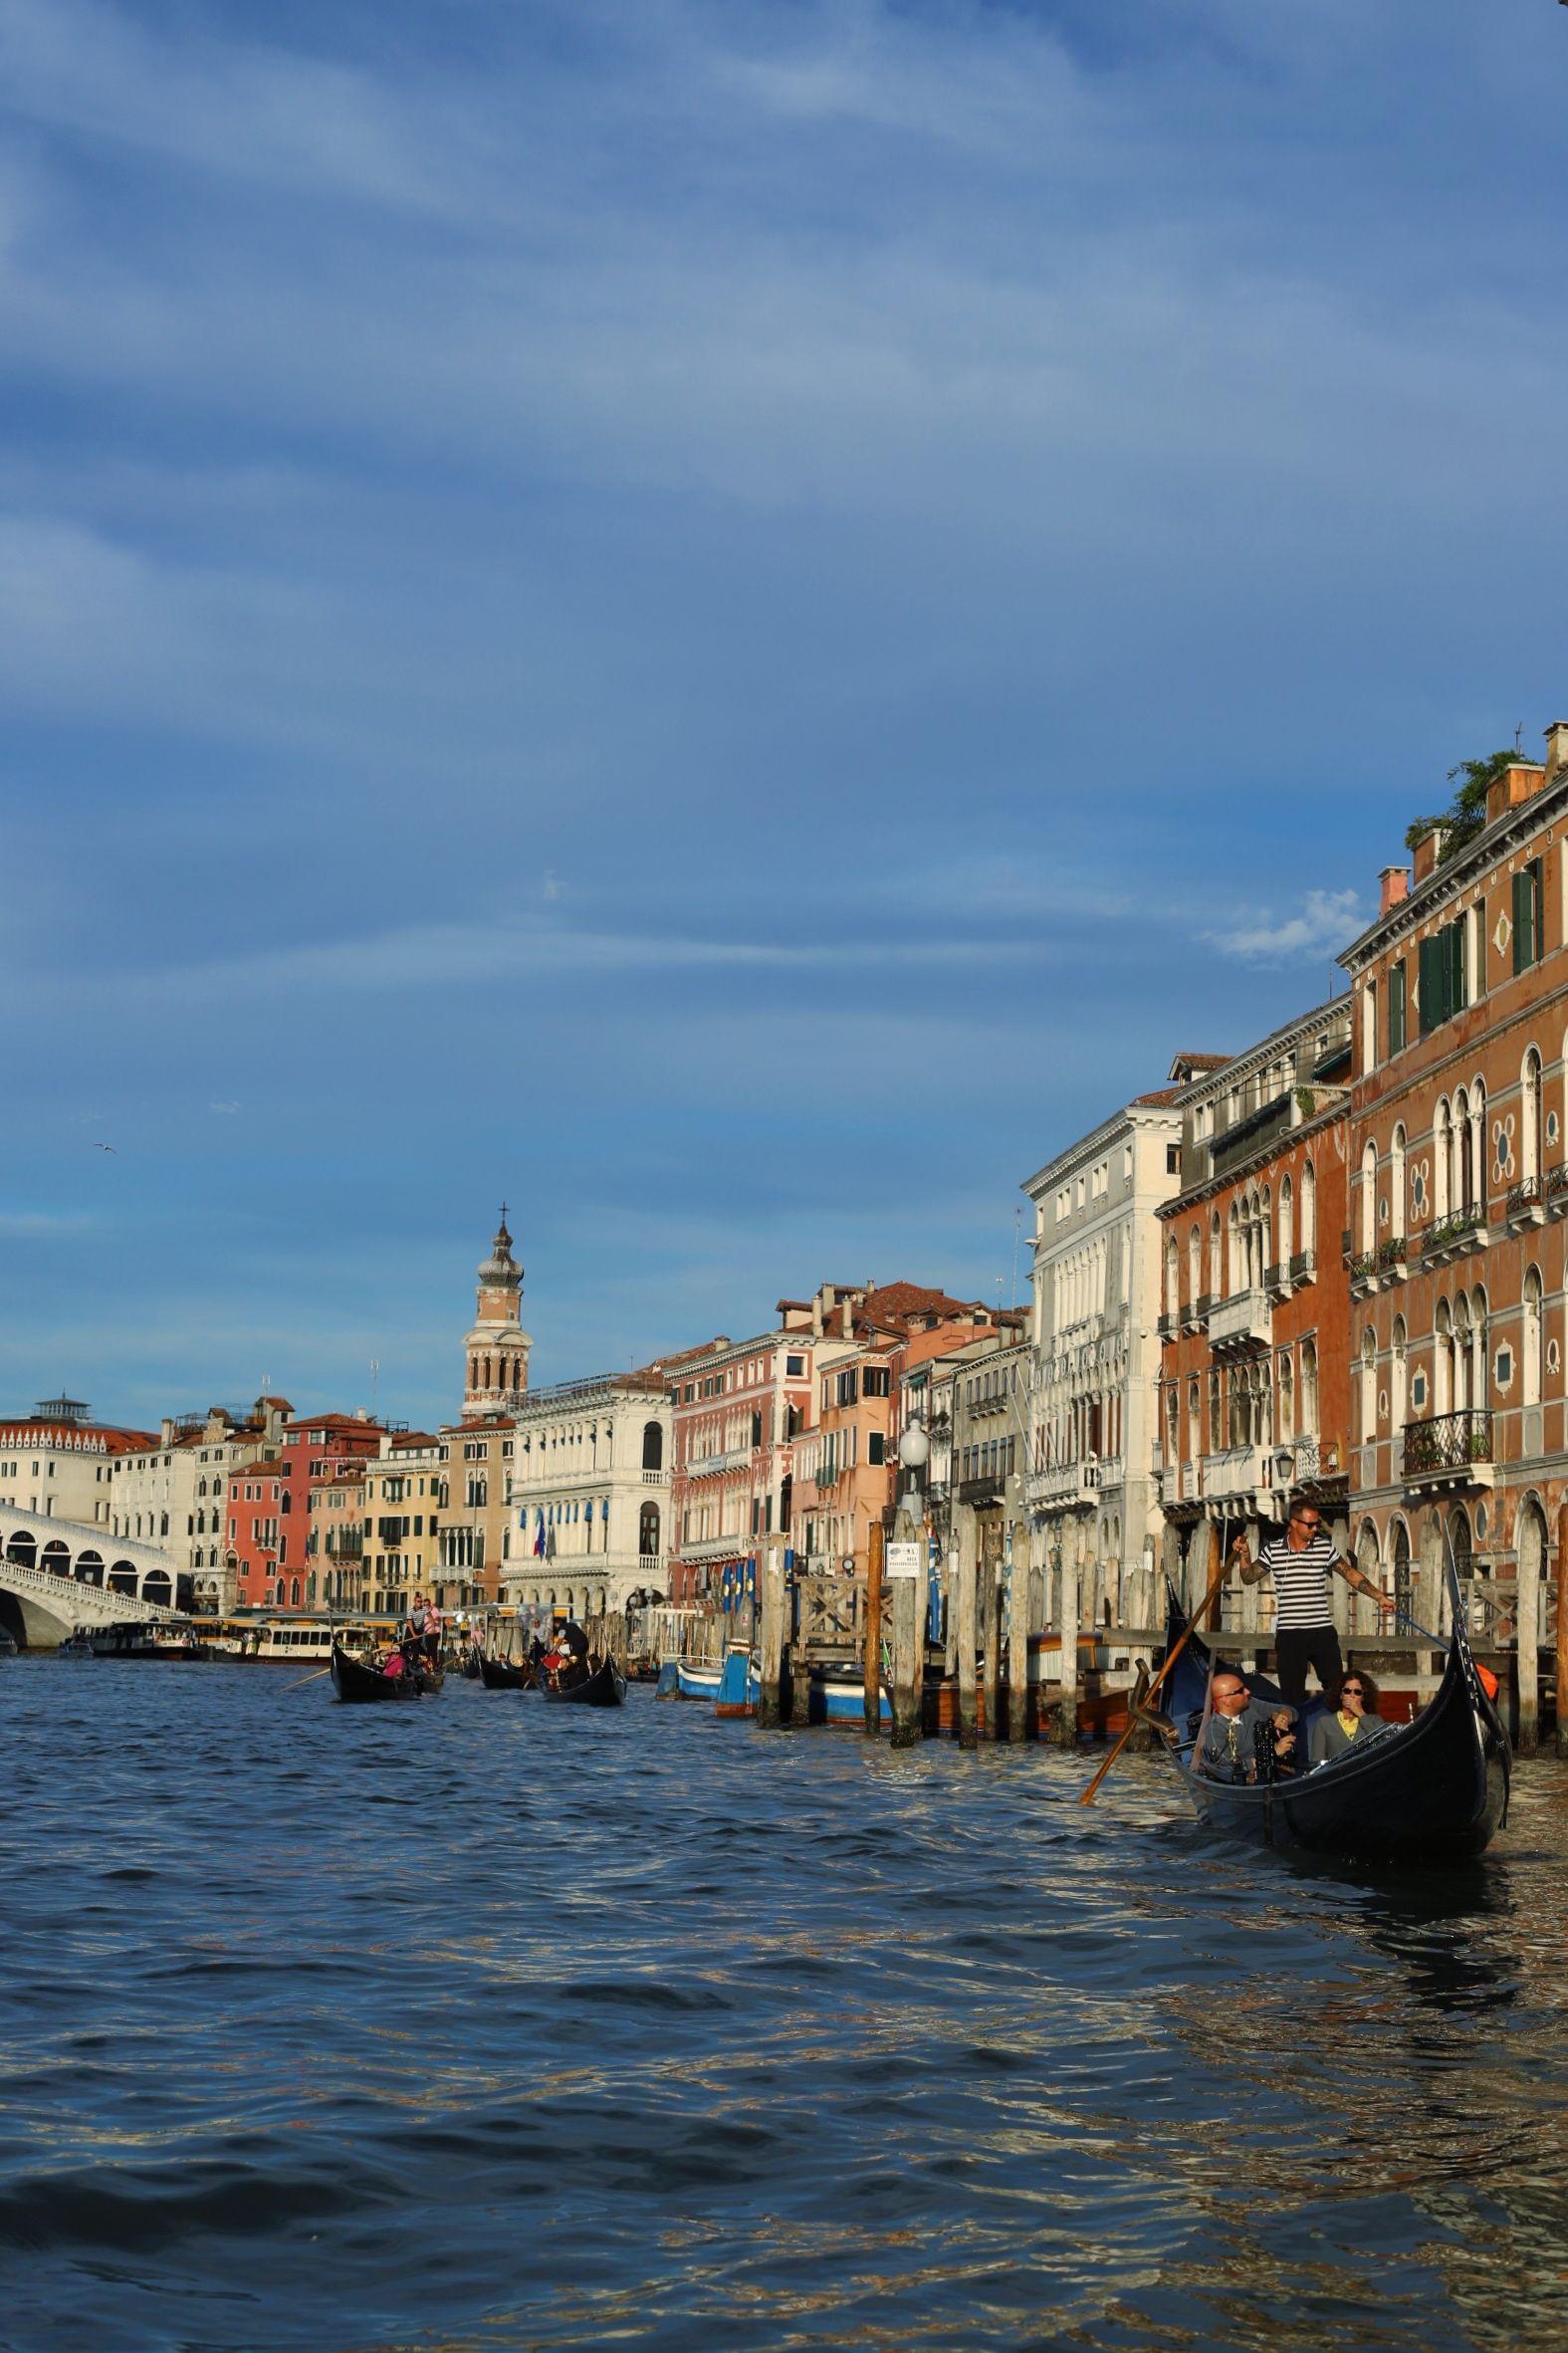 Rooftop Terraces & Gondolas in Venice | Female Travel